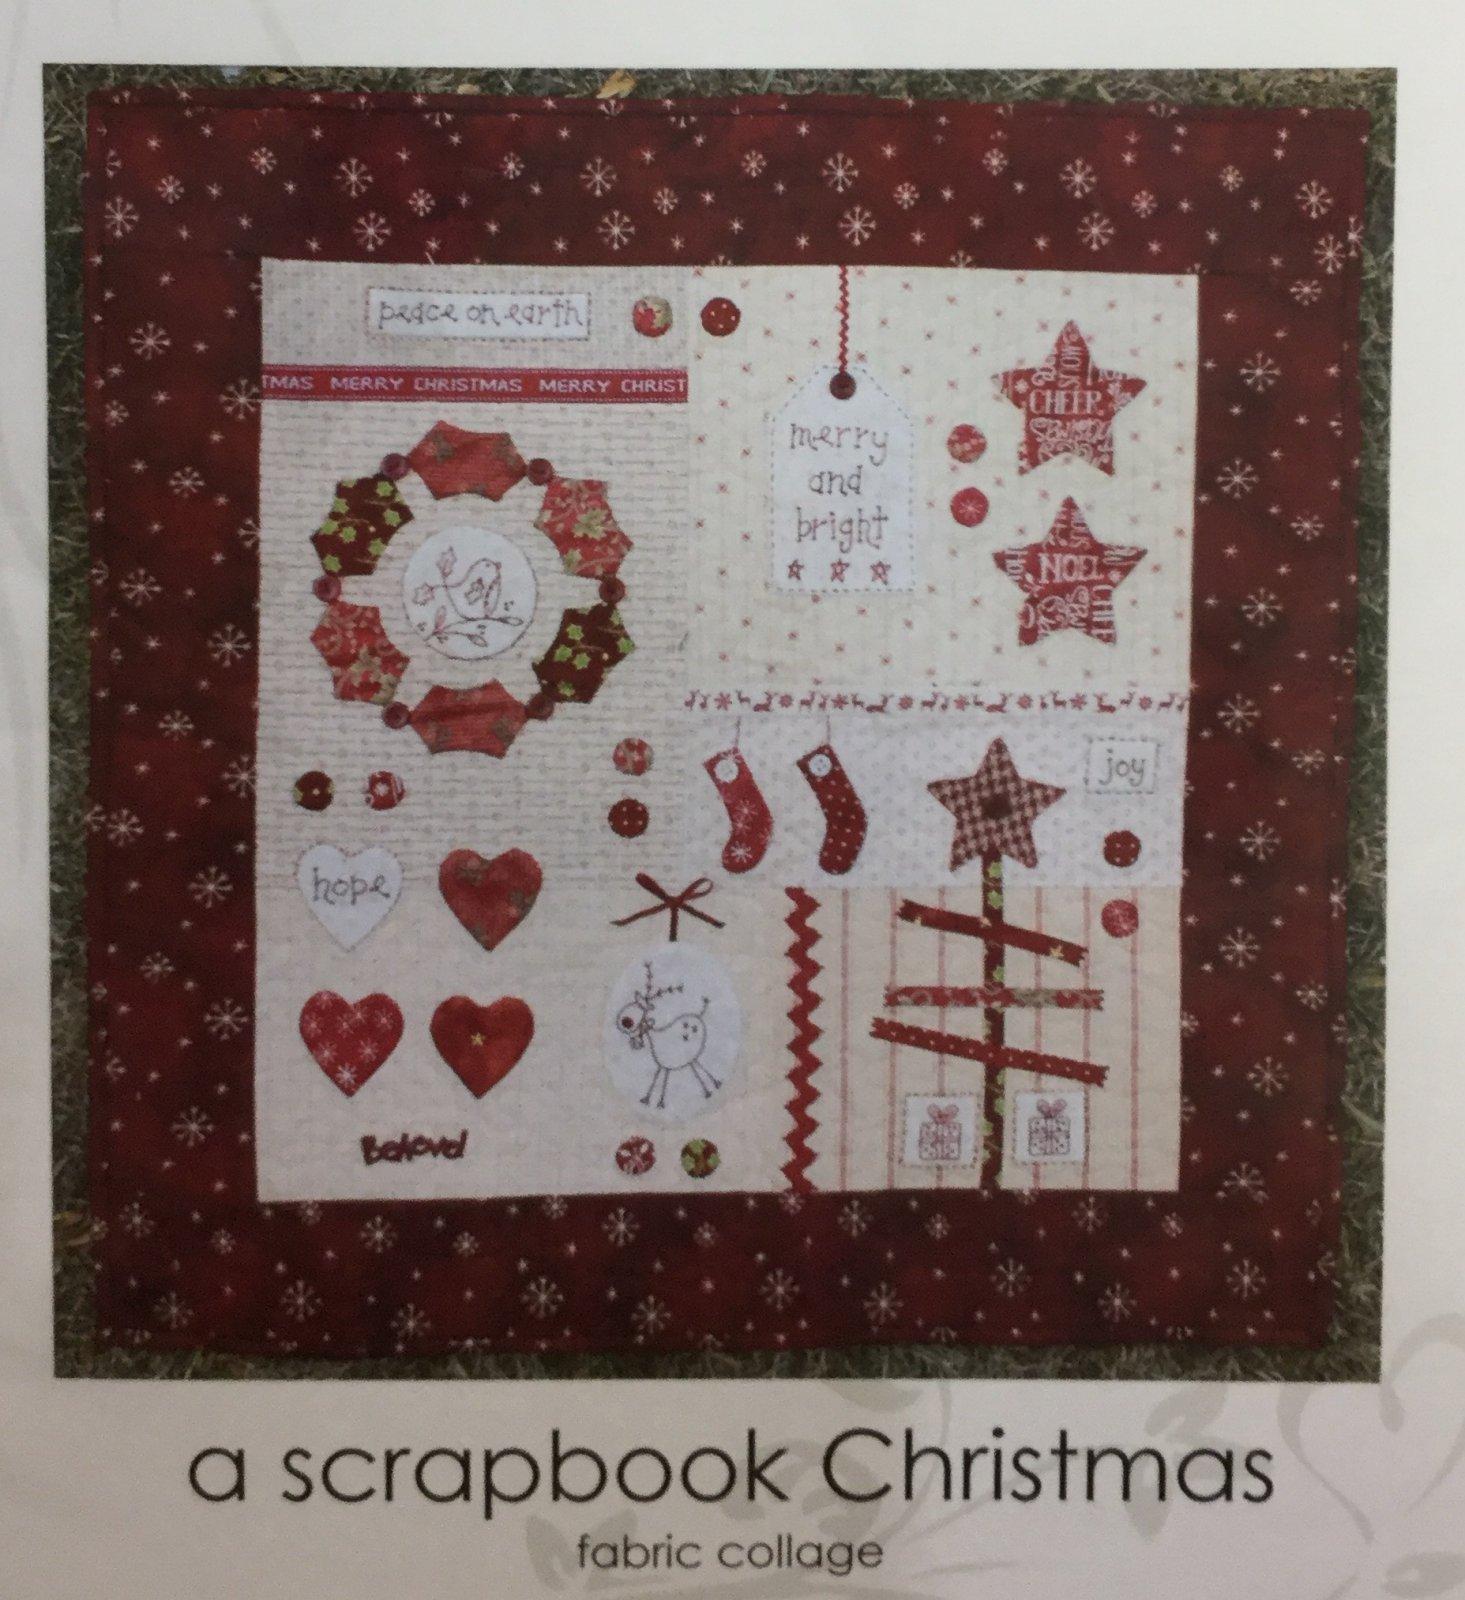 A Scrapbook Christmas by Gail Pan